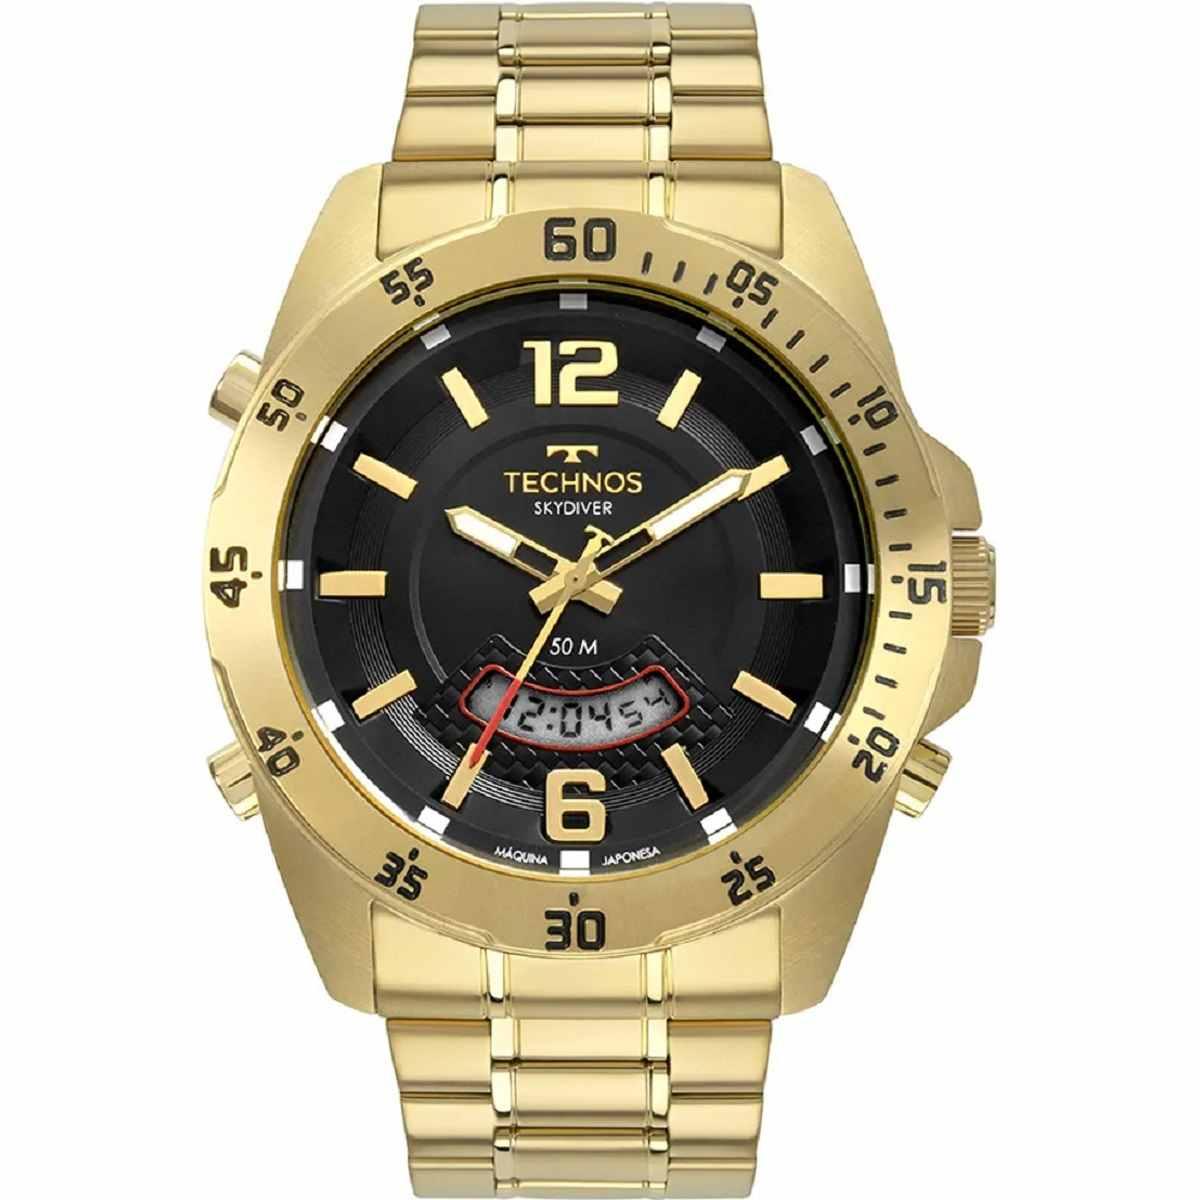 Relógio Technos Performance Masculino Dourado Digital e Analógico T205JL/4P